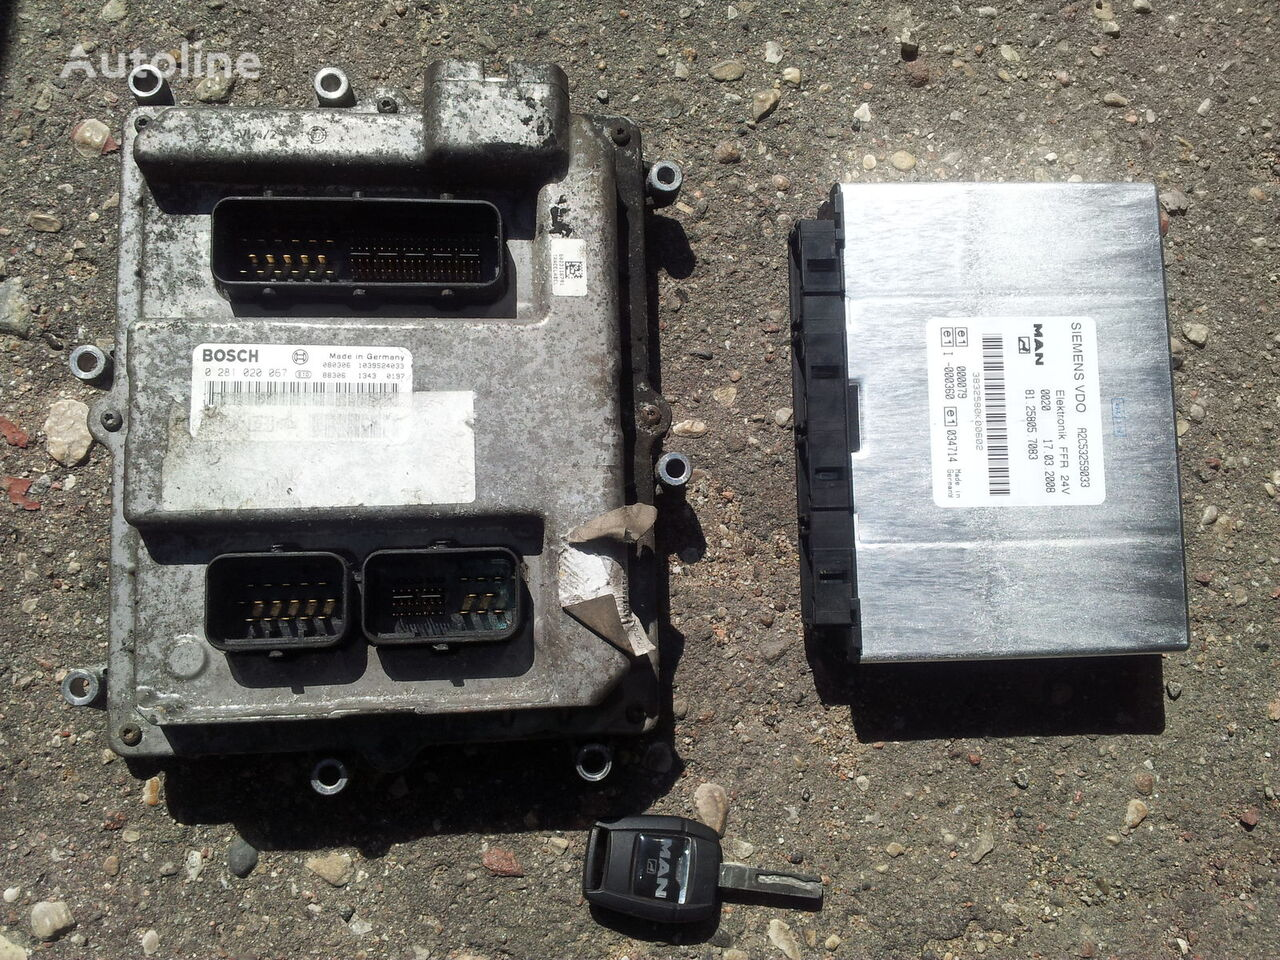 nadzorna enota MAN TGX ignition set >>>>> BOSCH 0281020067 + PTM + chip key, EURO 5 za vlačilec MAN TGA, TGX, TGL, TGM